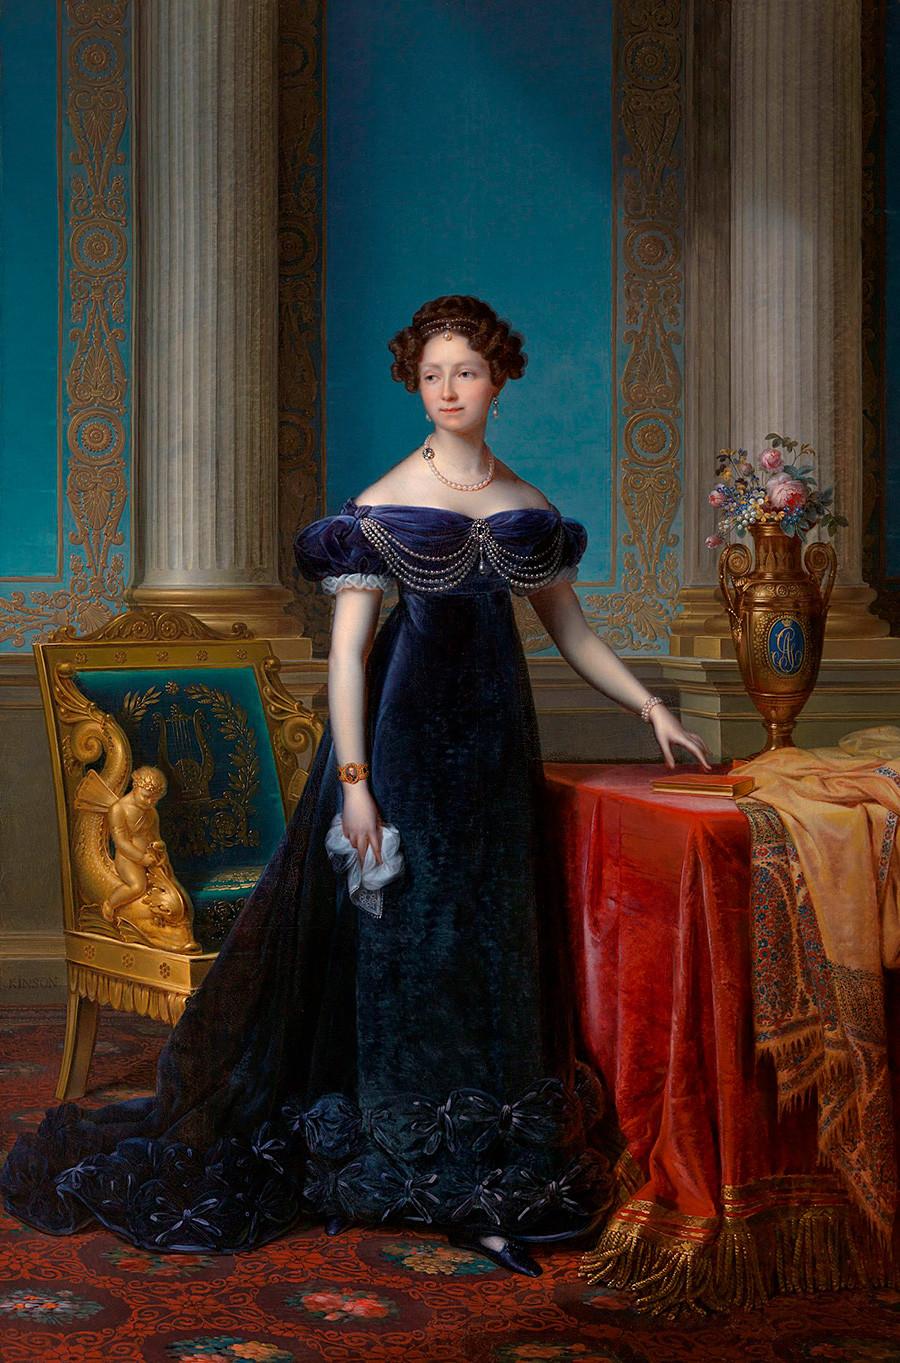 Anna Pavlovna di Russia